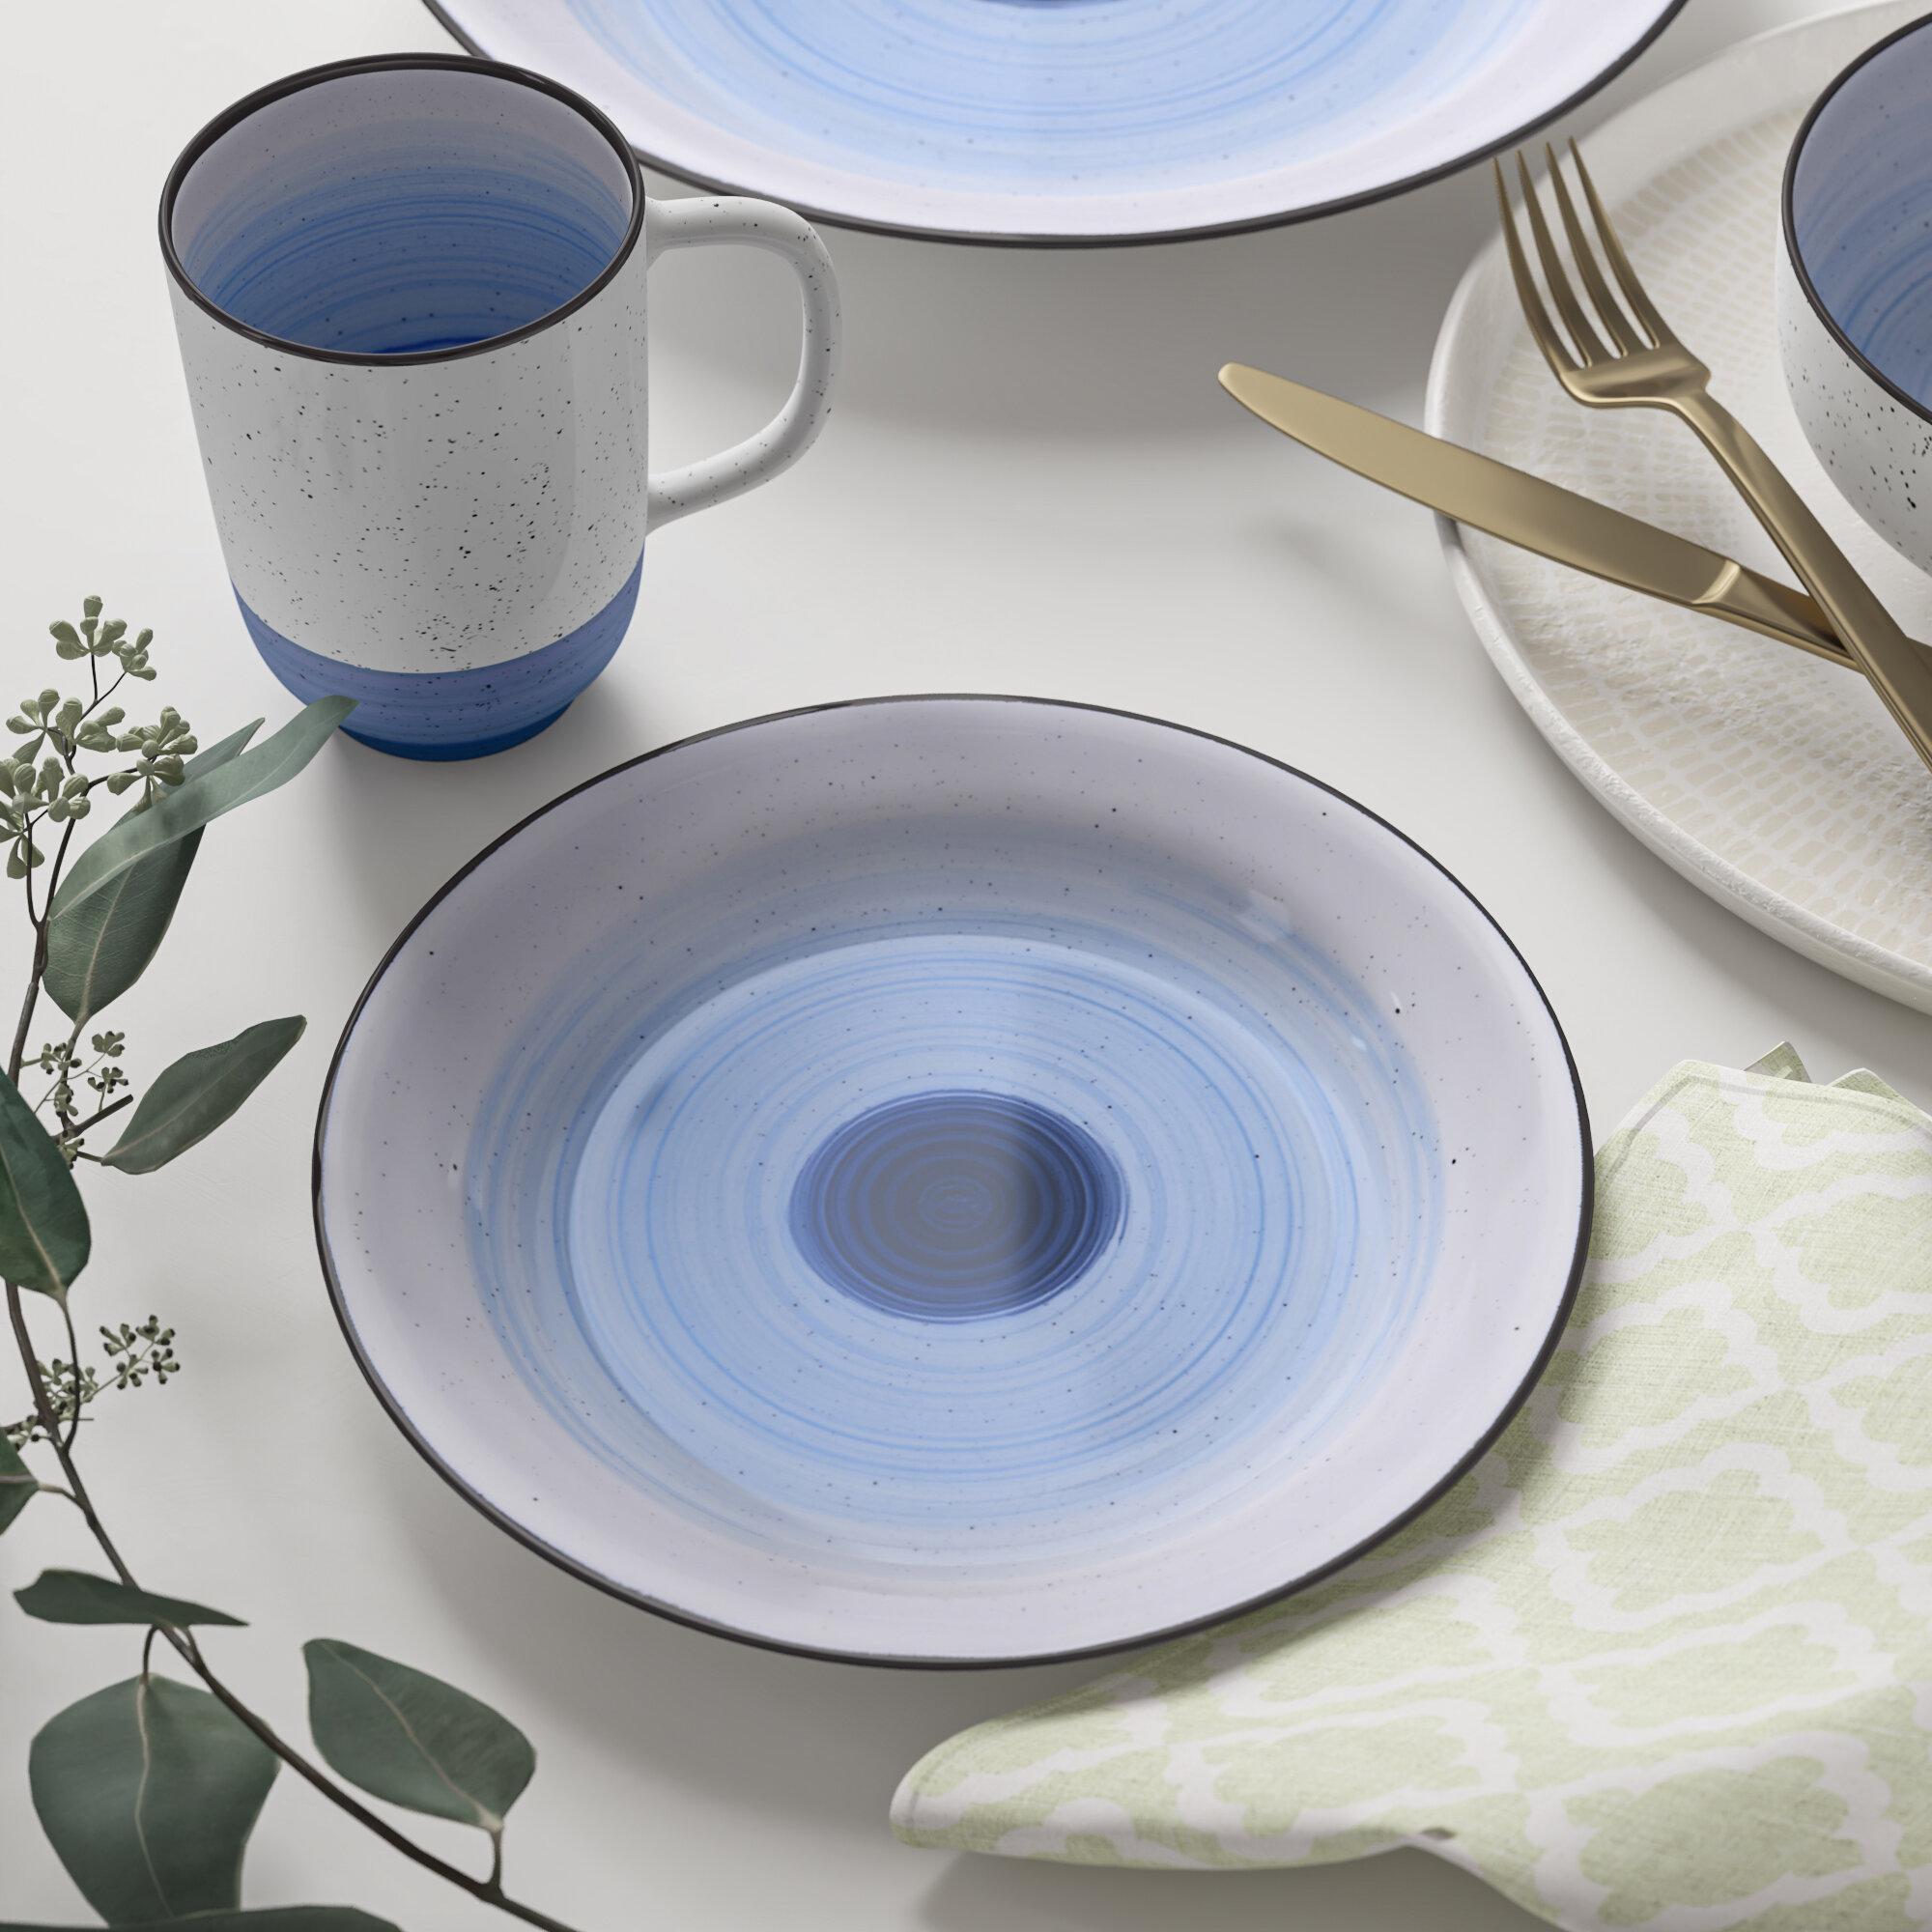 Mason 7 Piece Bone China Dinnerware Set, Service for 7